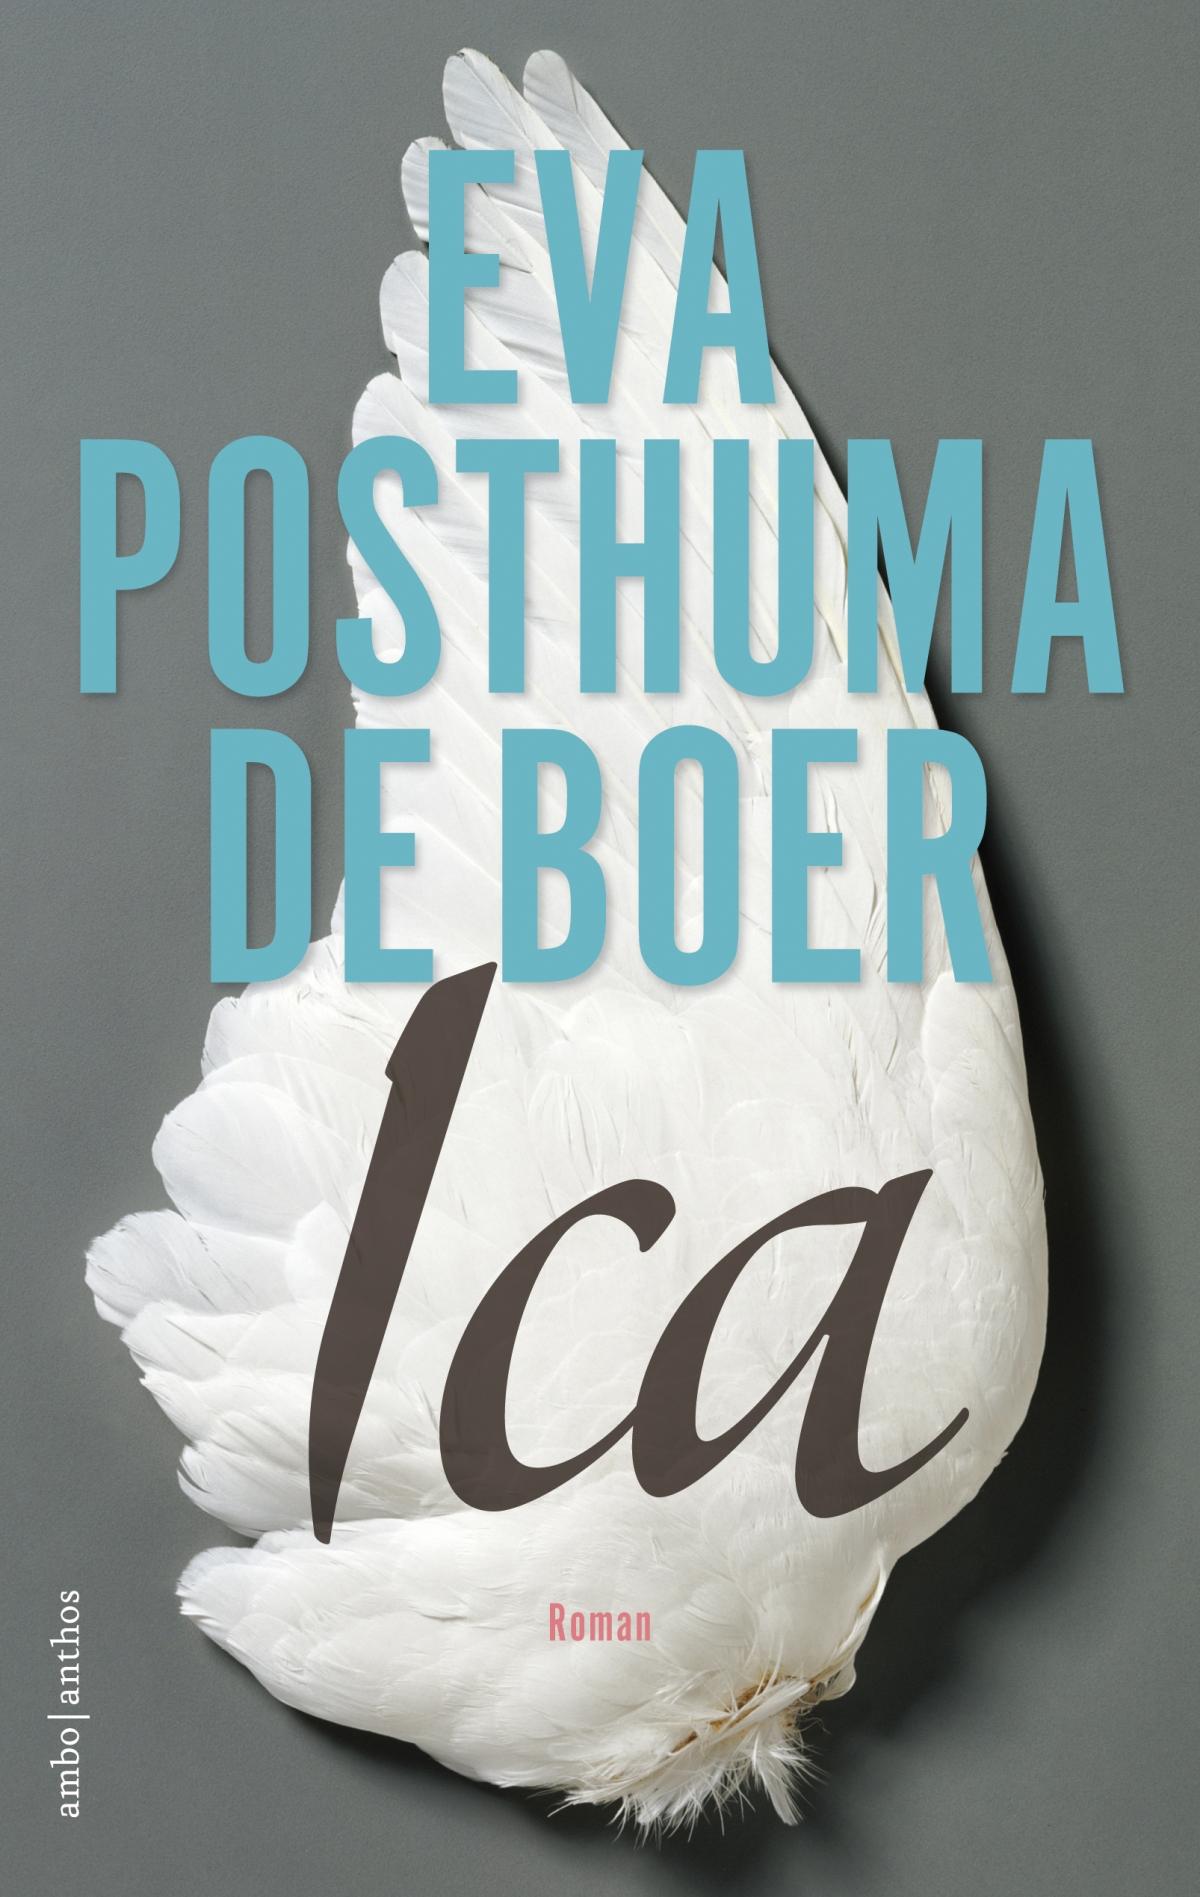 Ica - Eva Posthuma de Boer